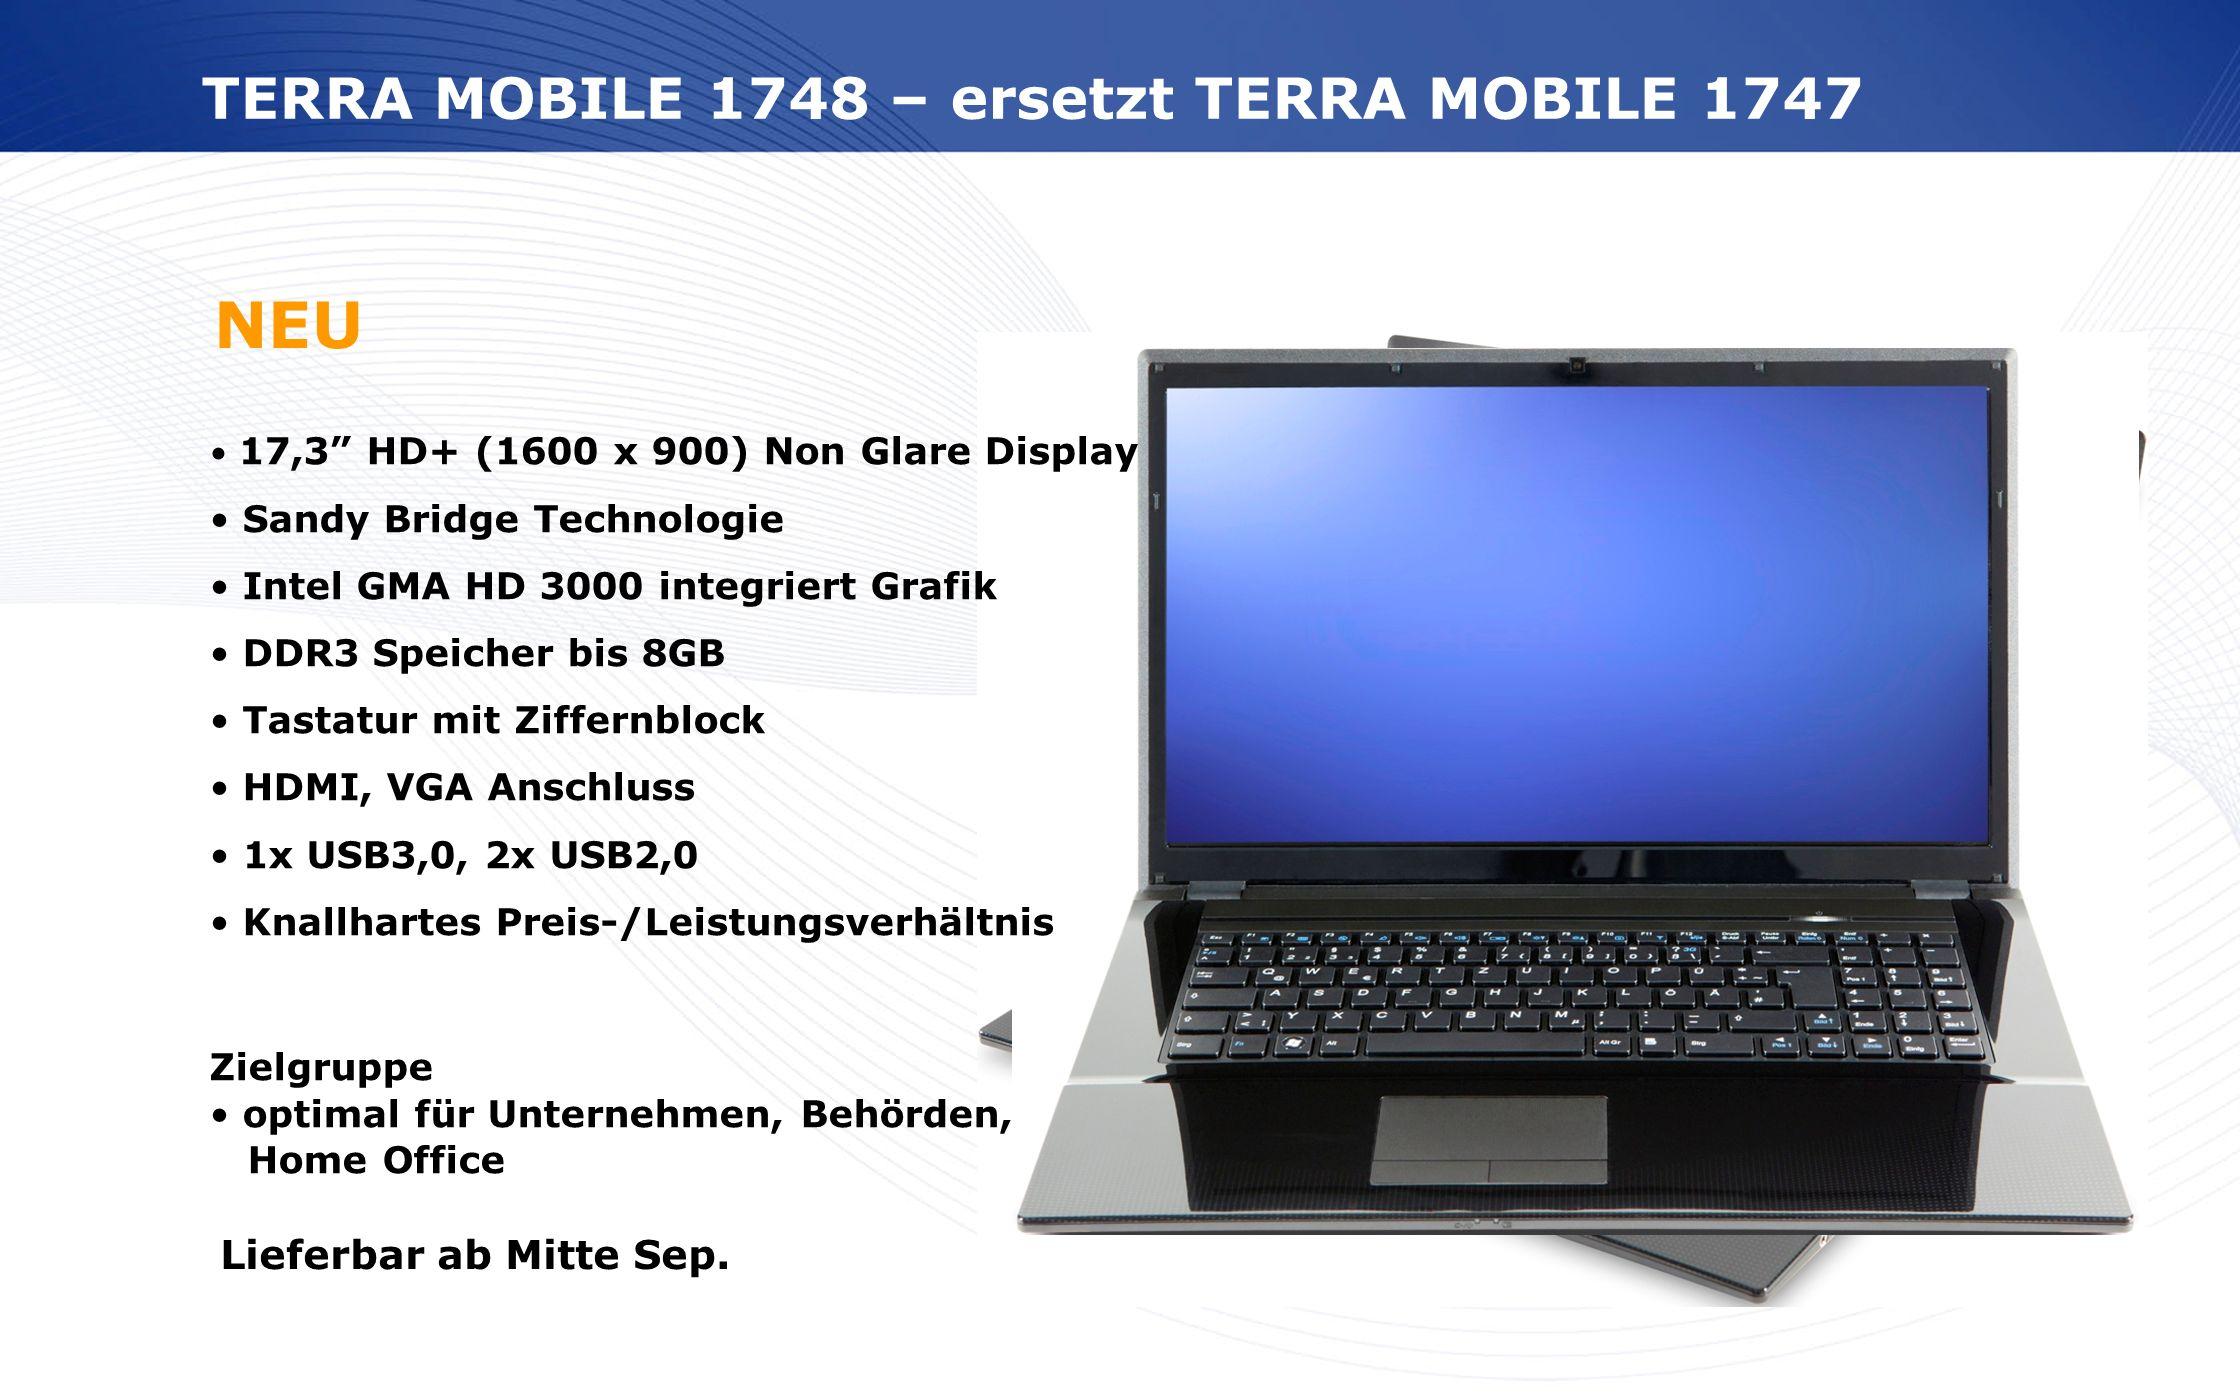 NEU TERRA MOBILE 1748 – ersetzt TERRA MOBILE 1747